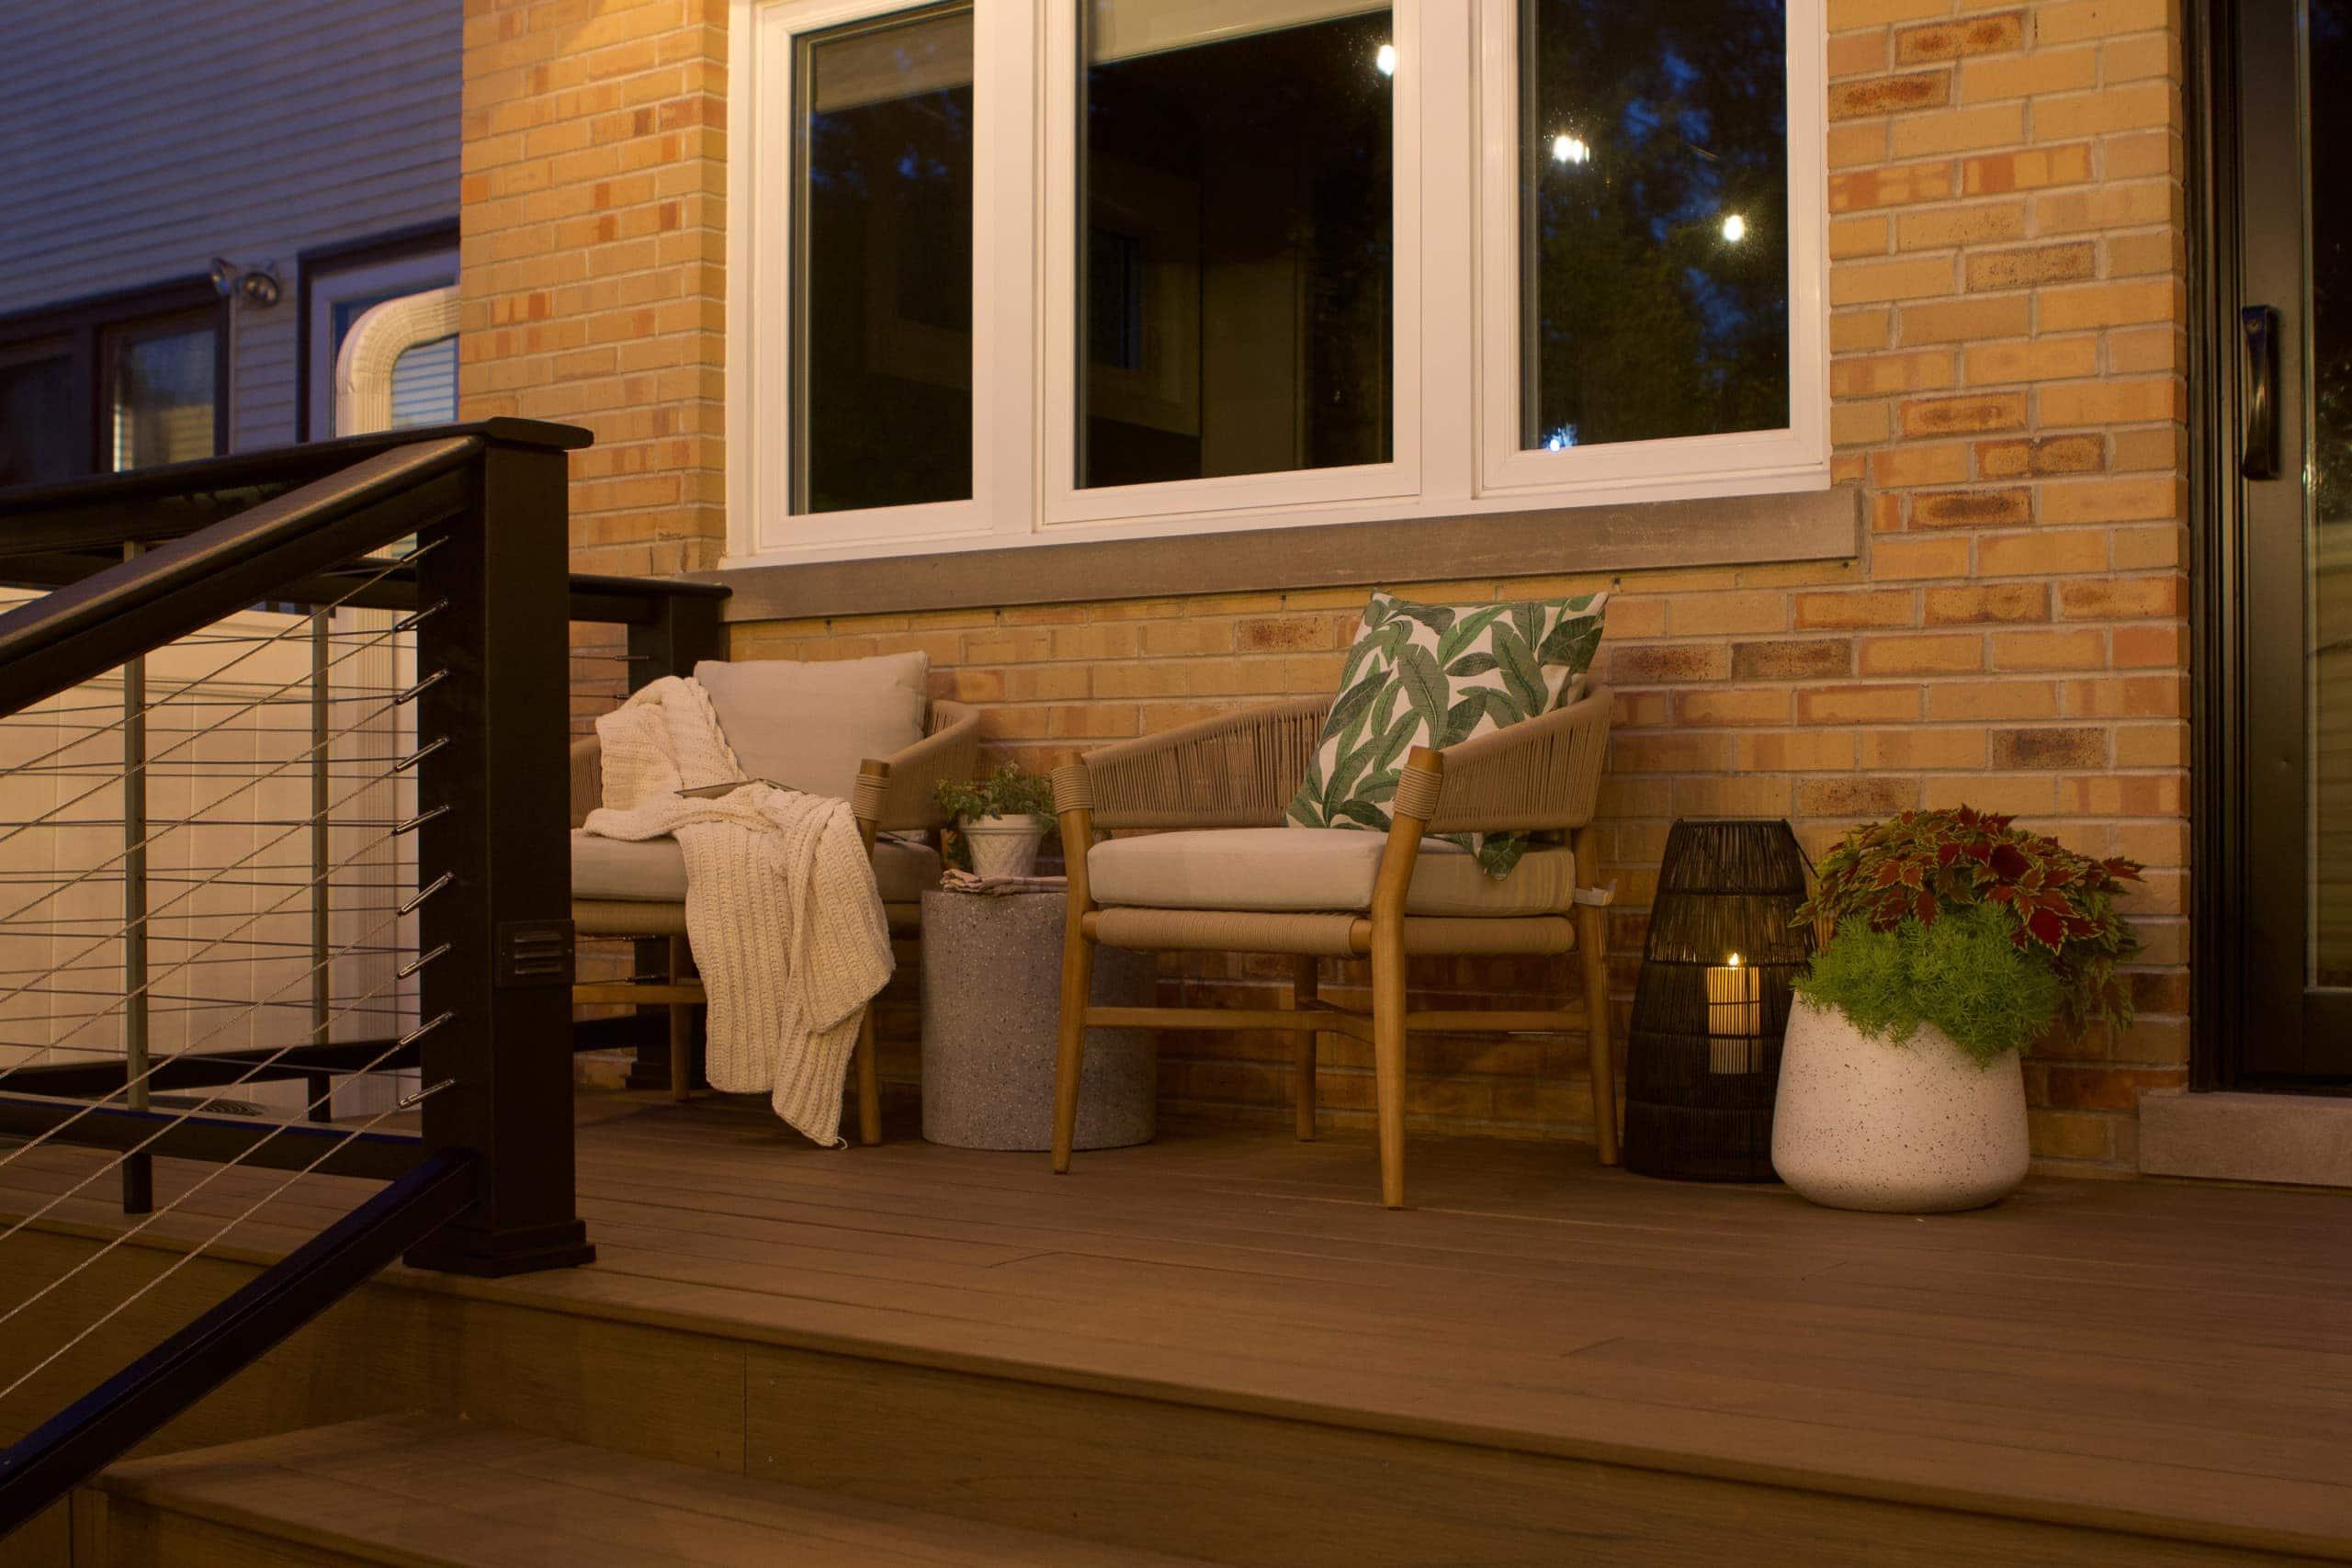 Enjoying our patio at night